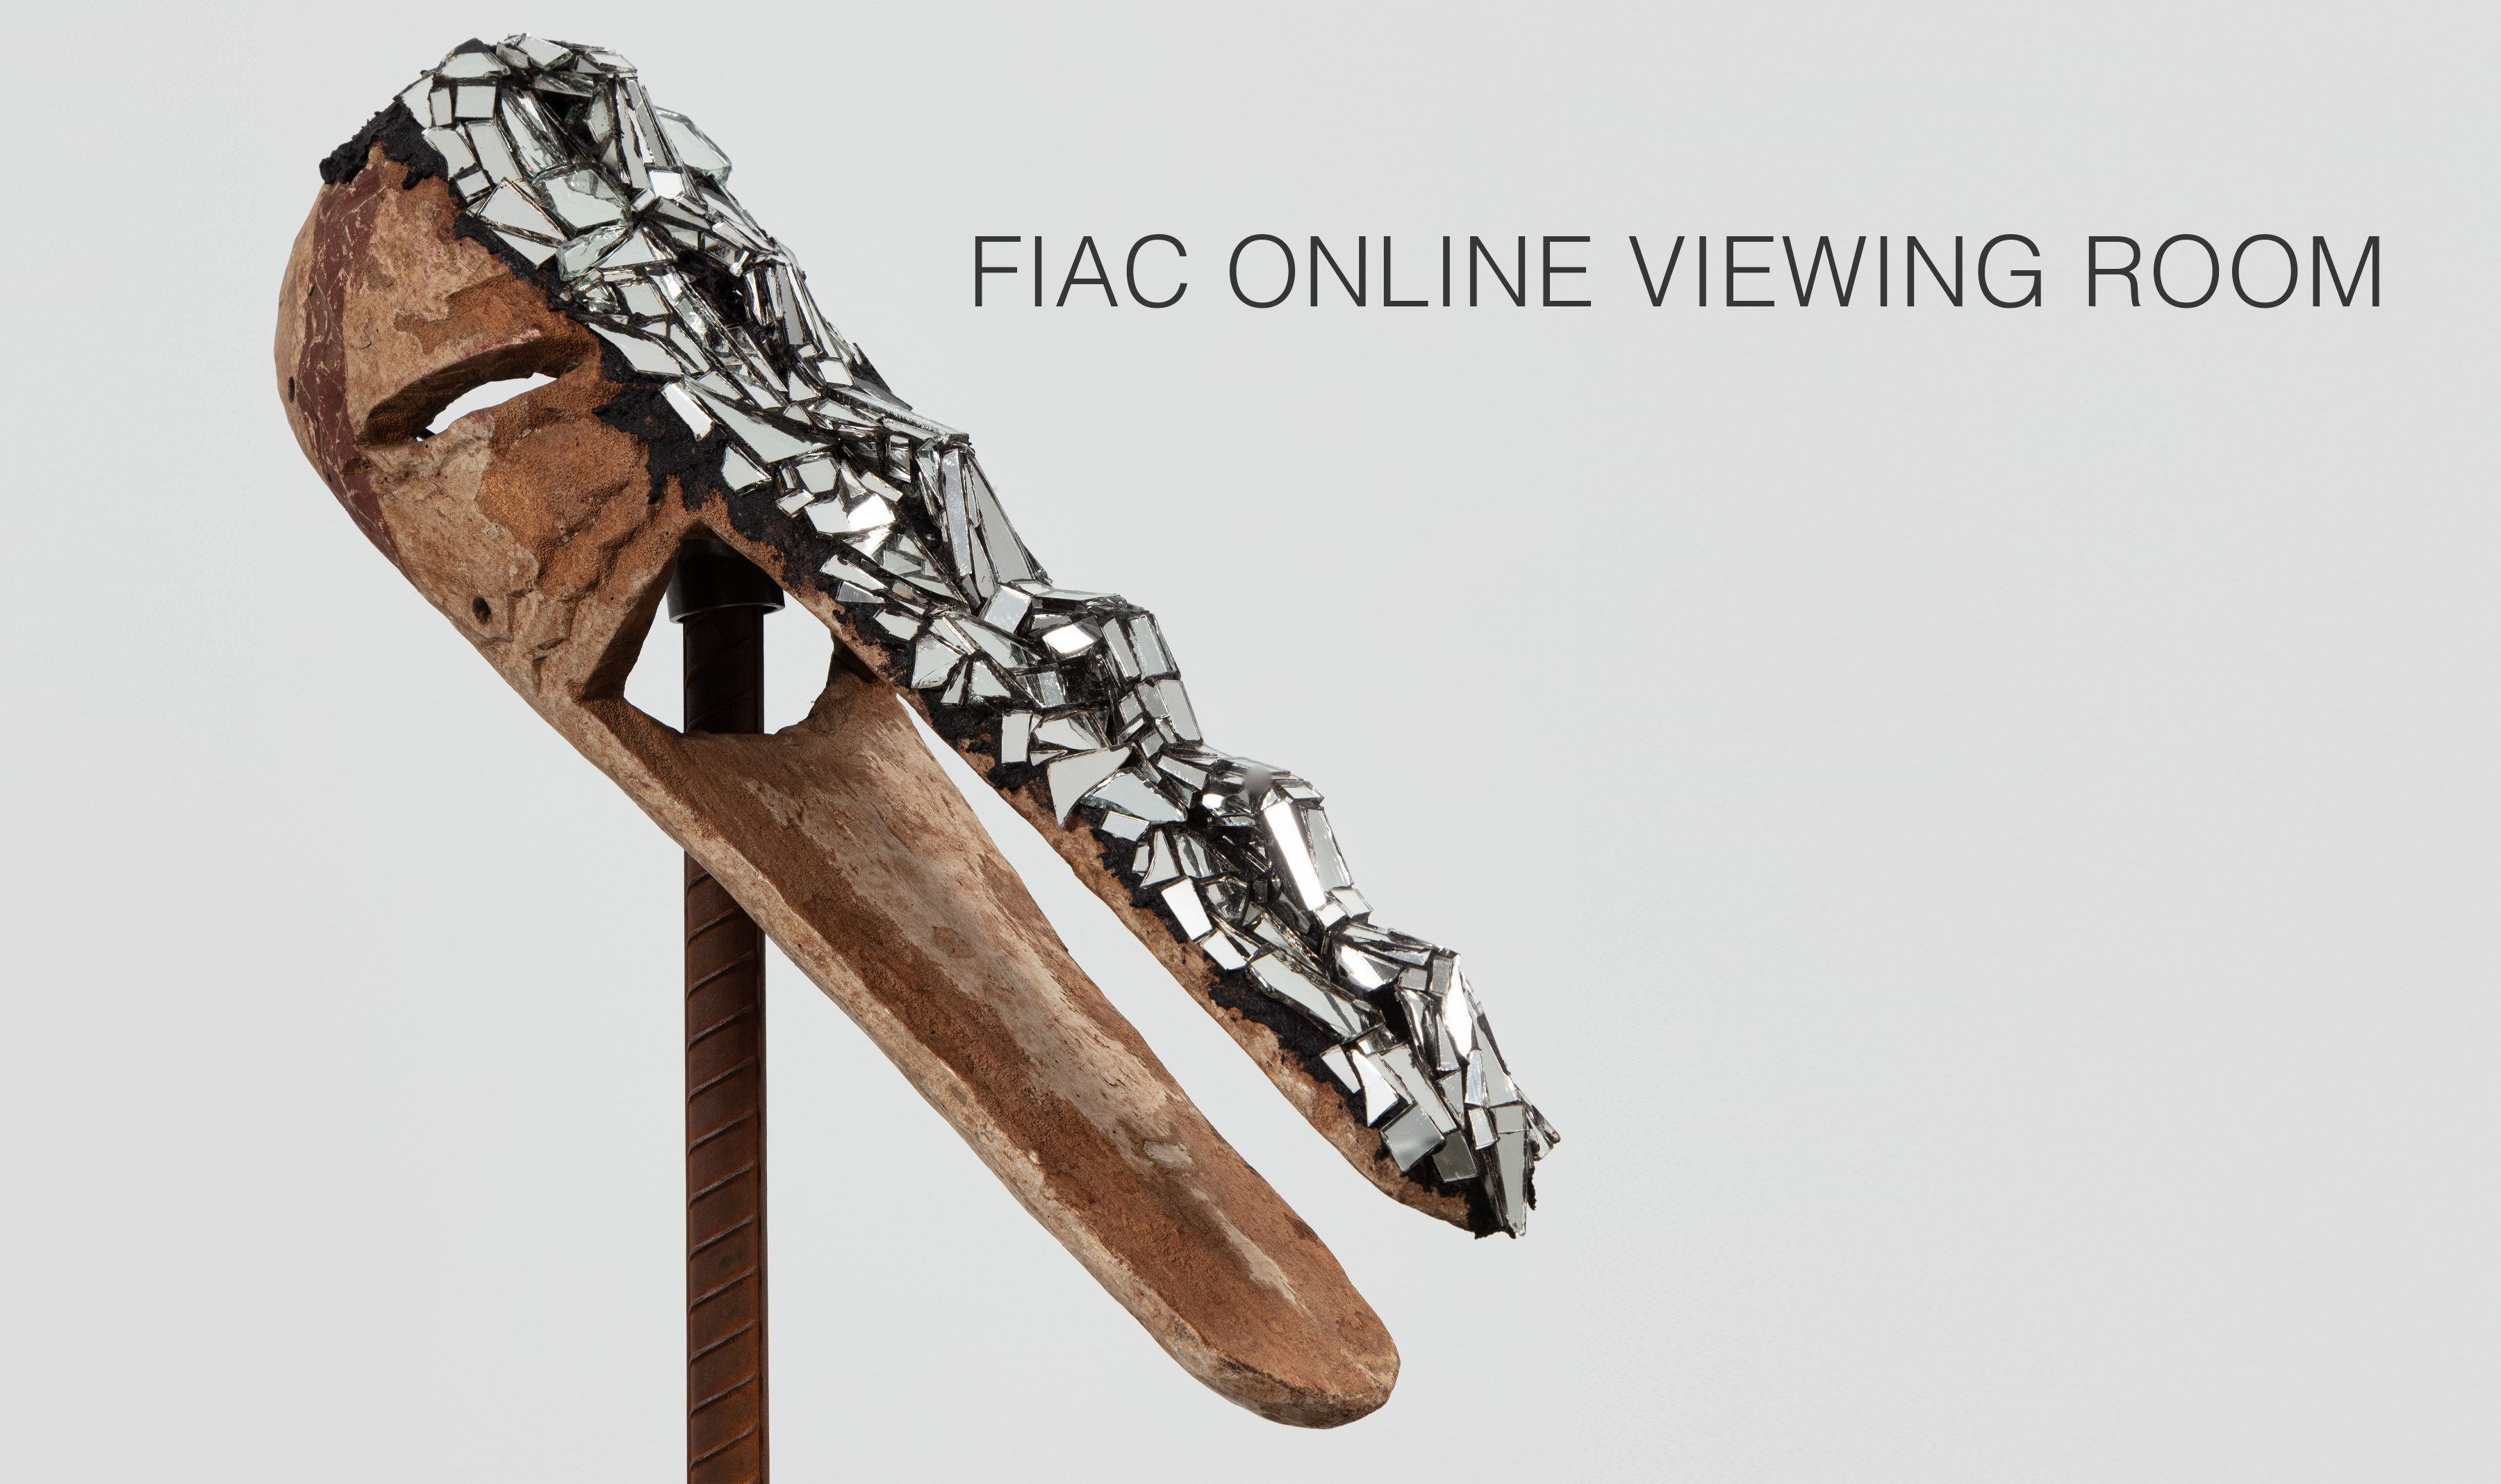 FIAC ONLINE VIEWING ROOM